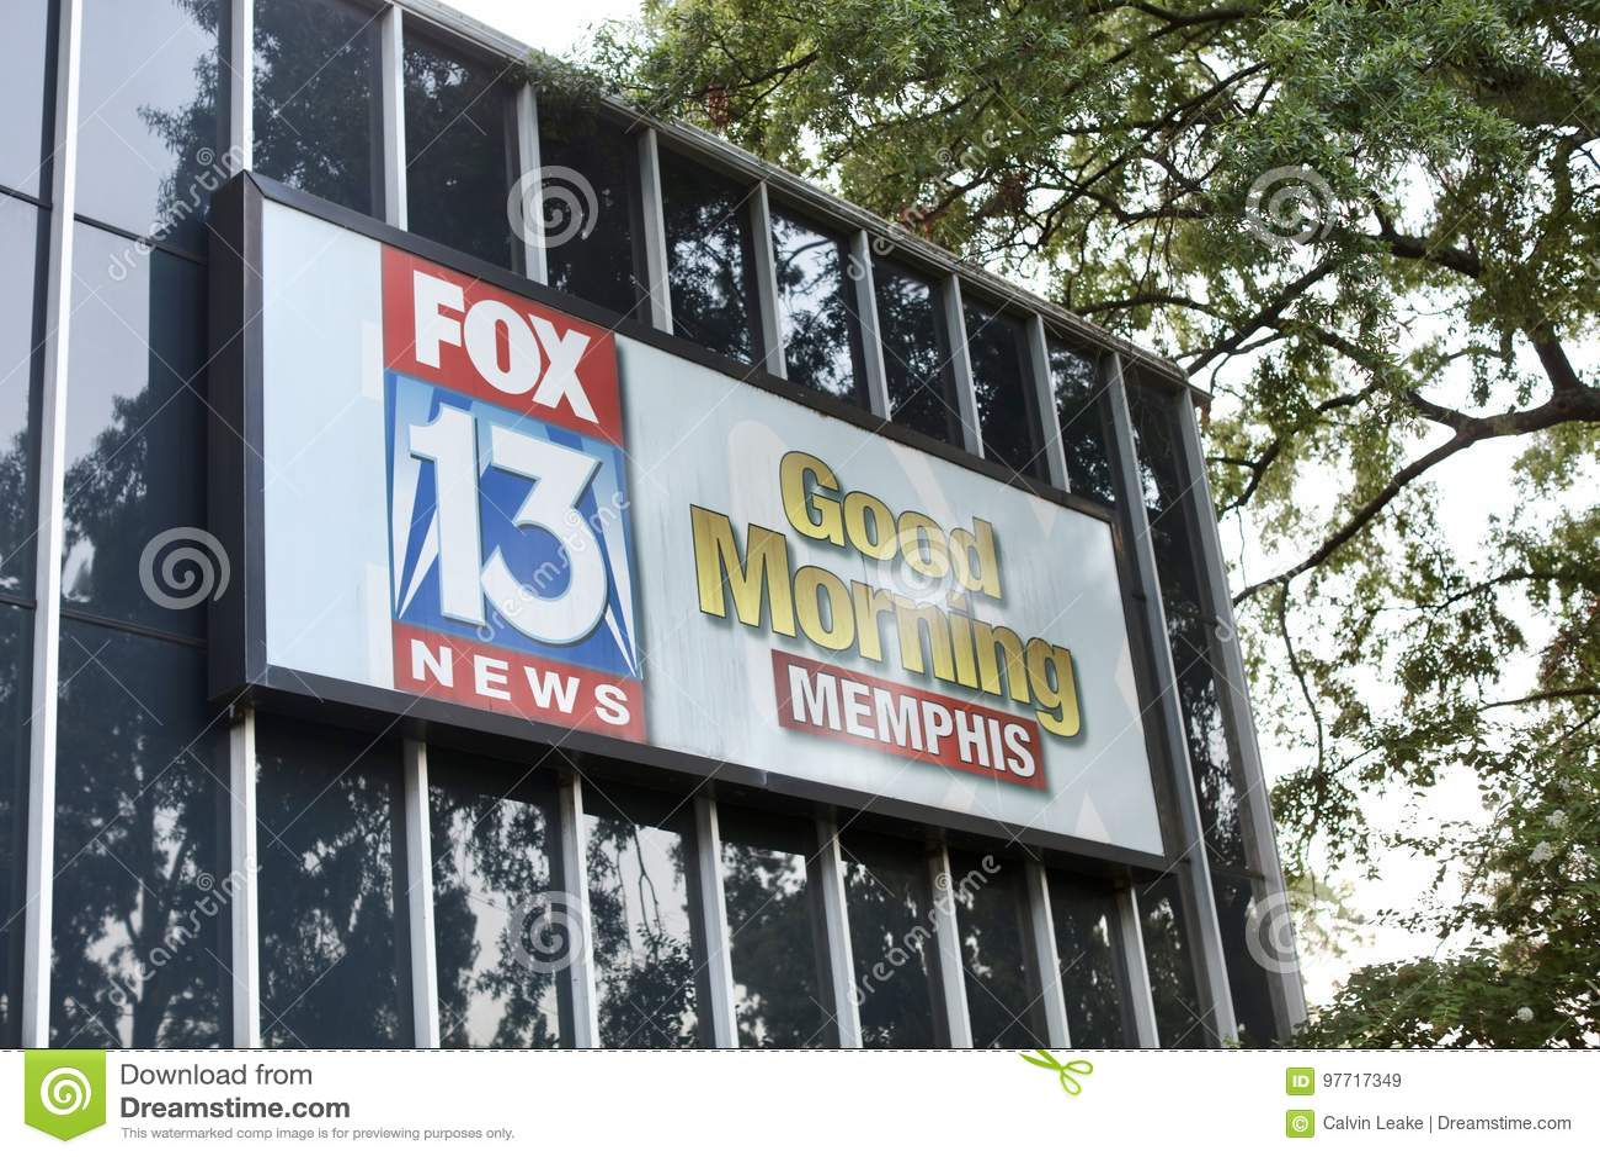 News Station Fox 13 Good Morming Memphis Editorial Stock Image